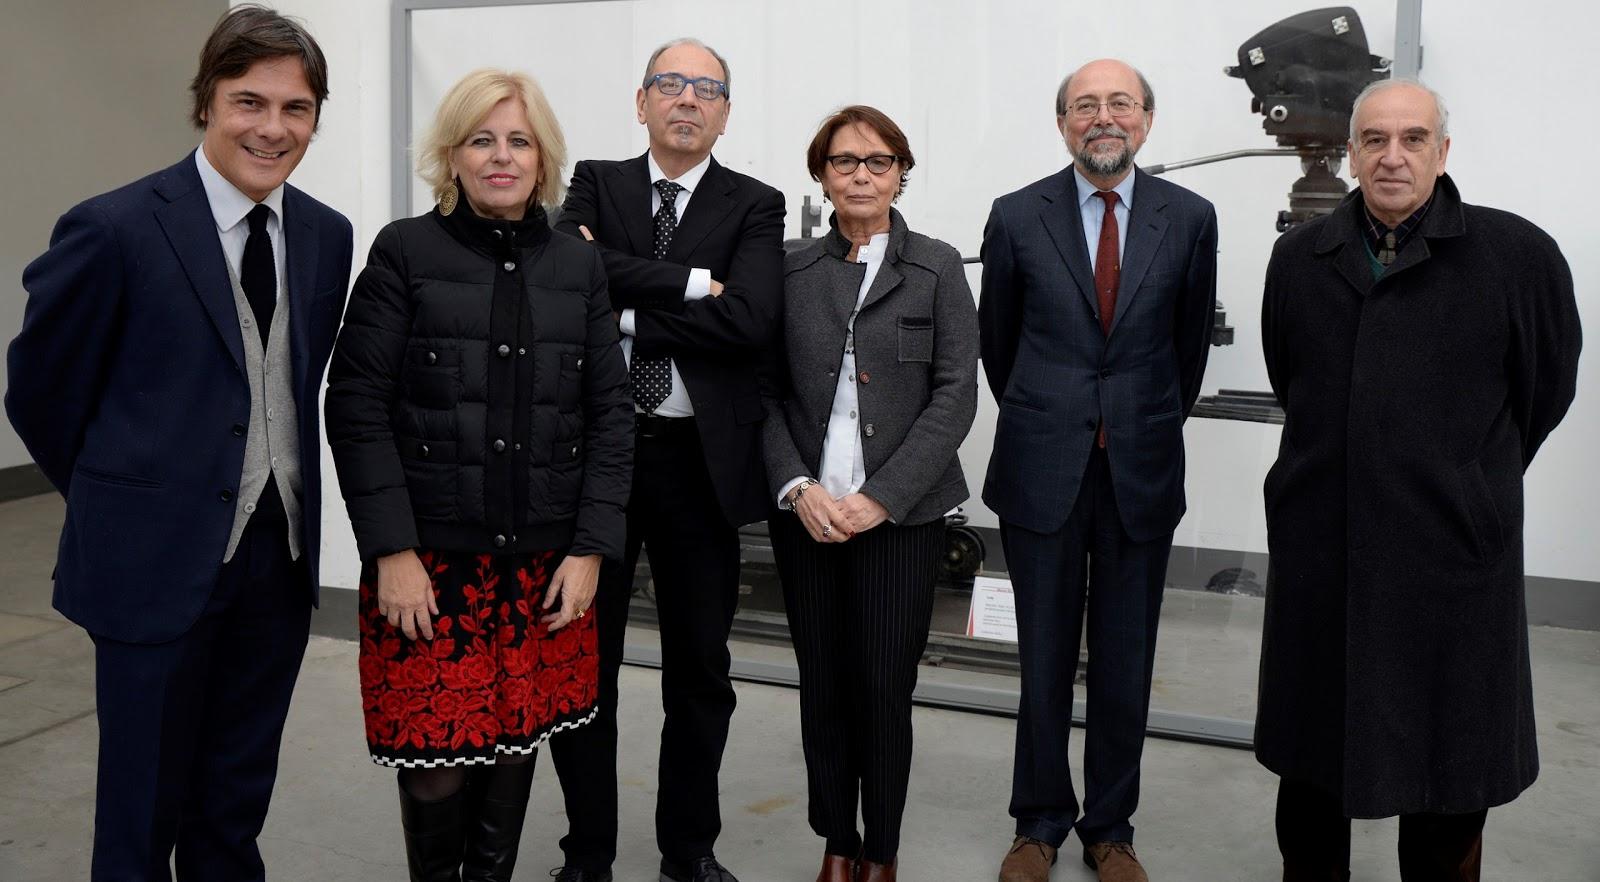 Cartoonia Piemonte Reloaded Gabo Su Torino